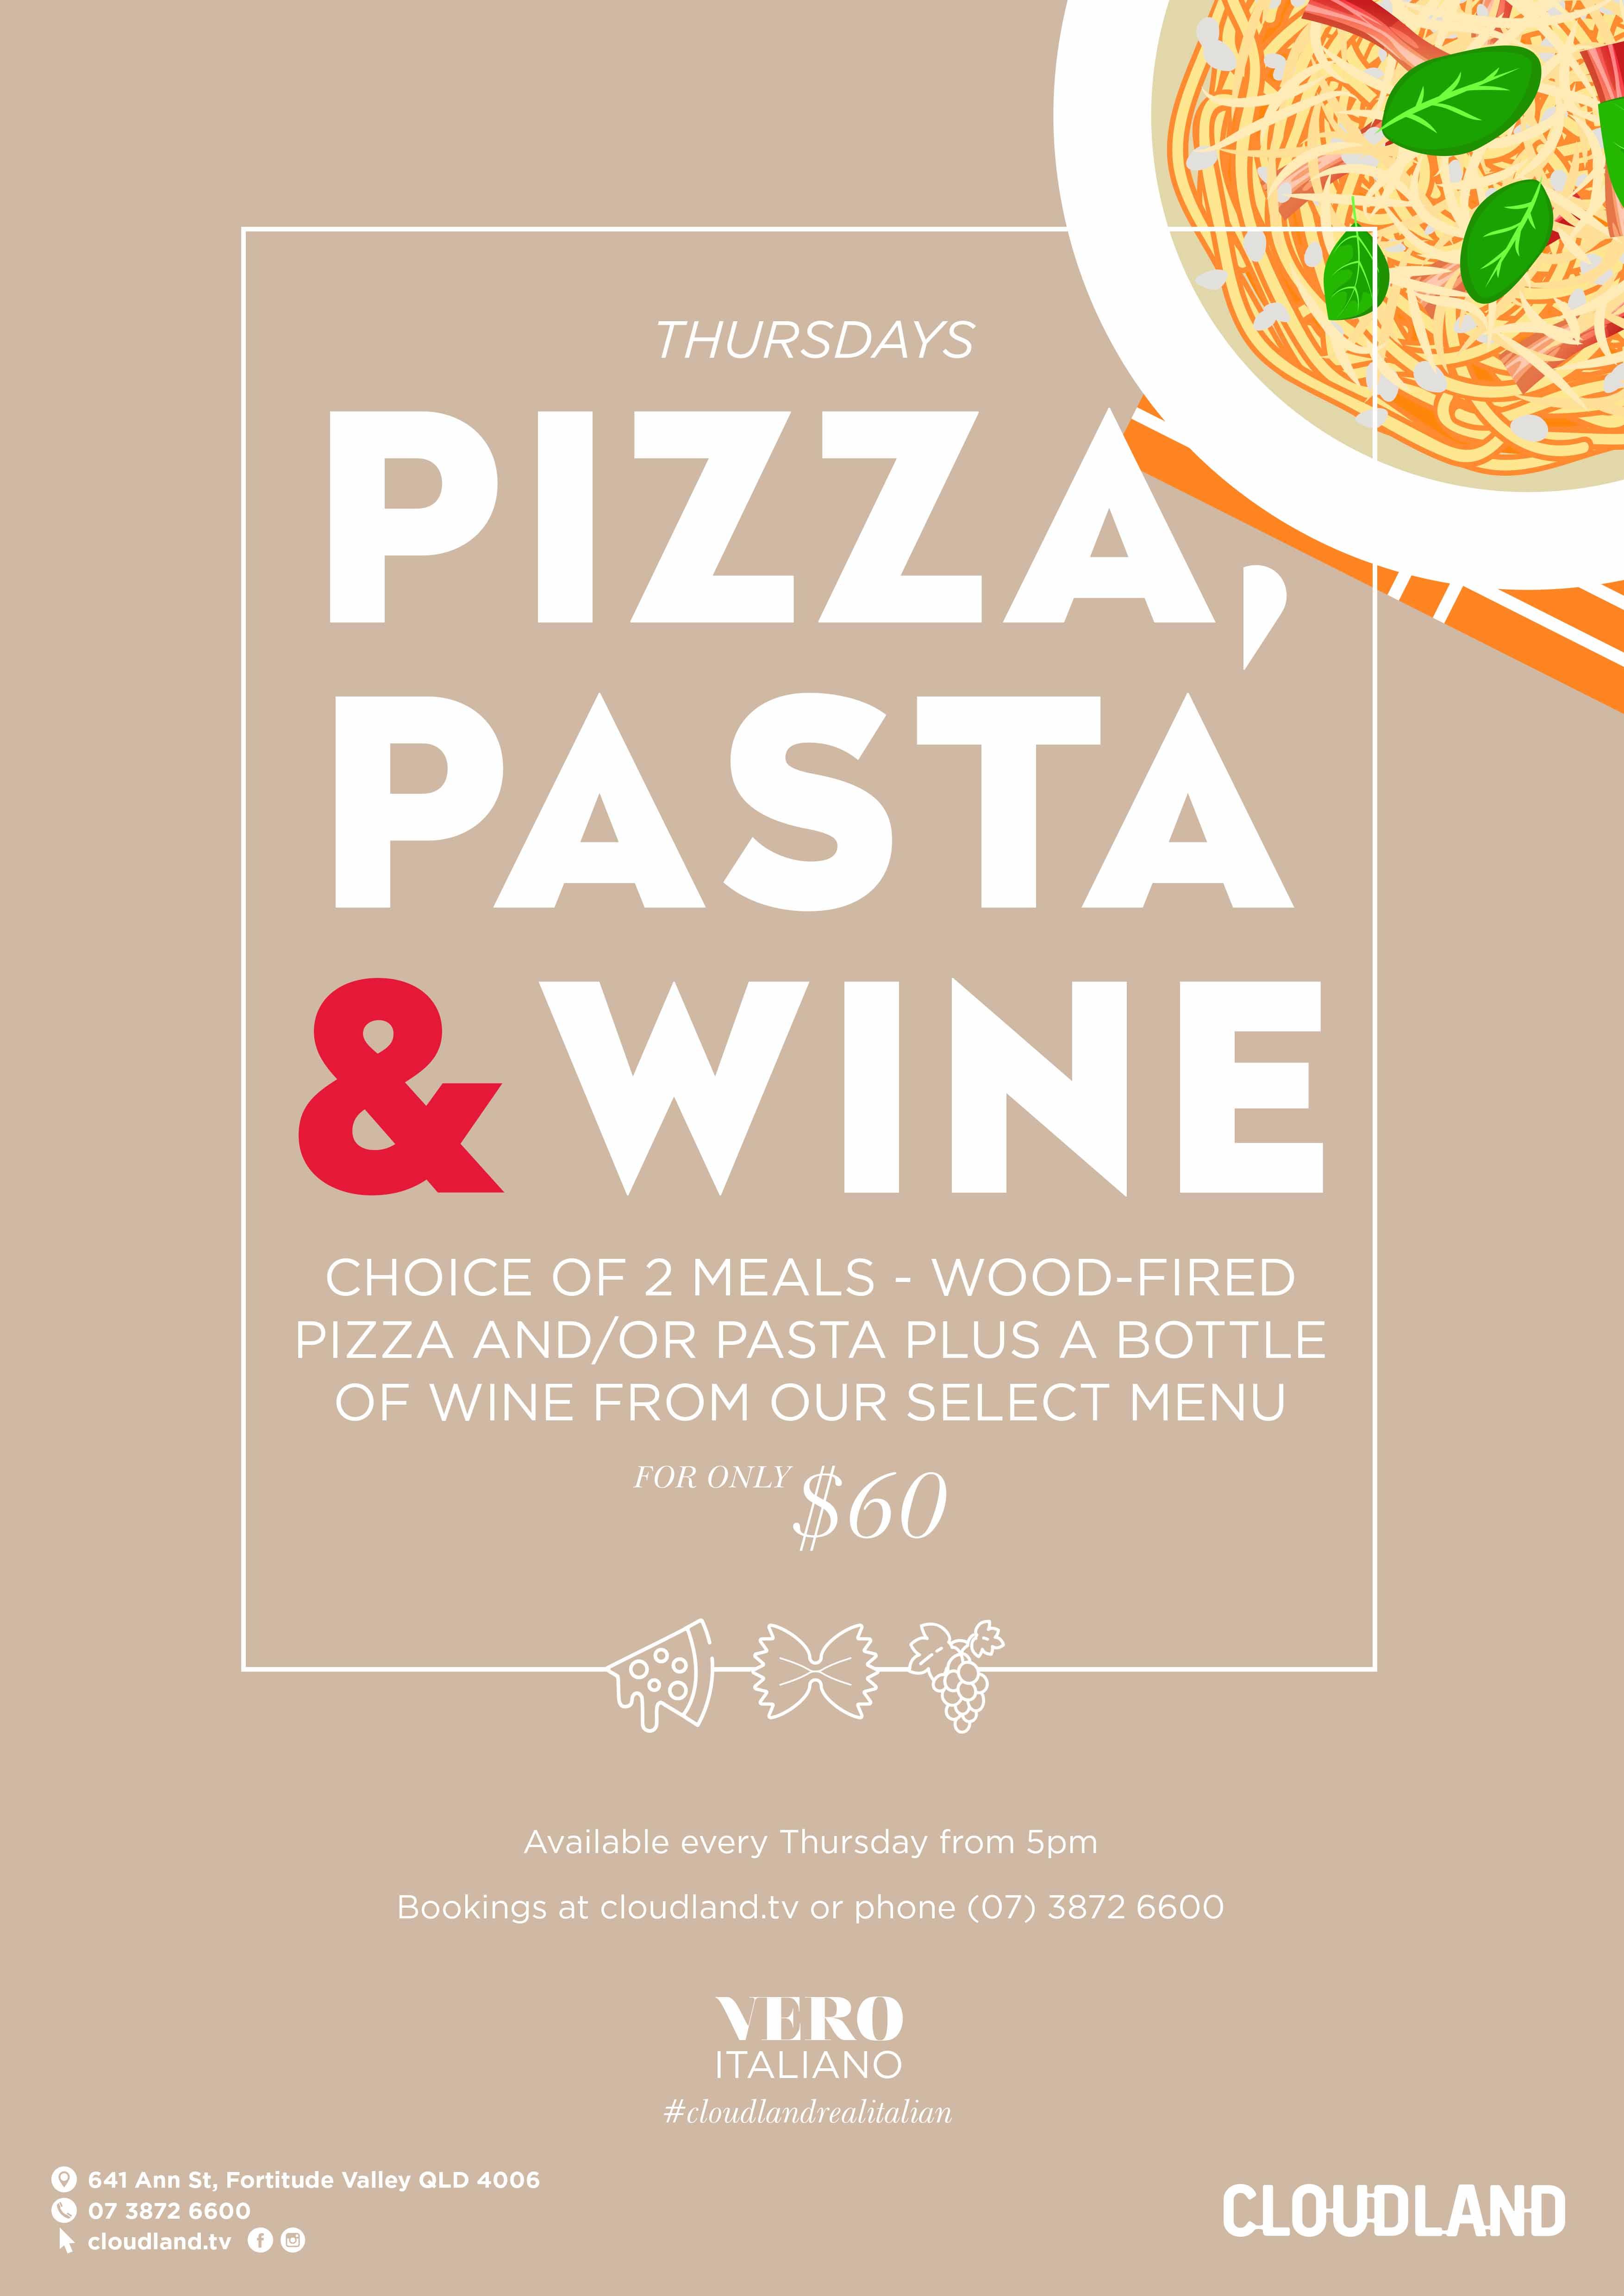 Pizza, Pasta, Wine